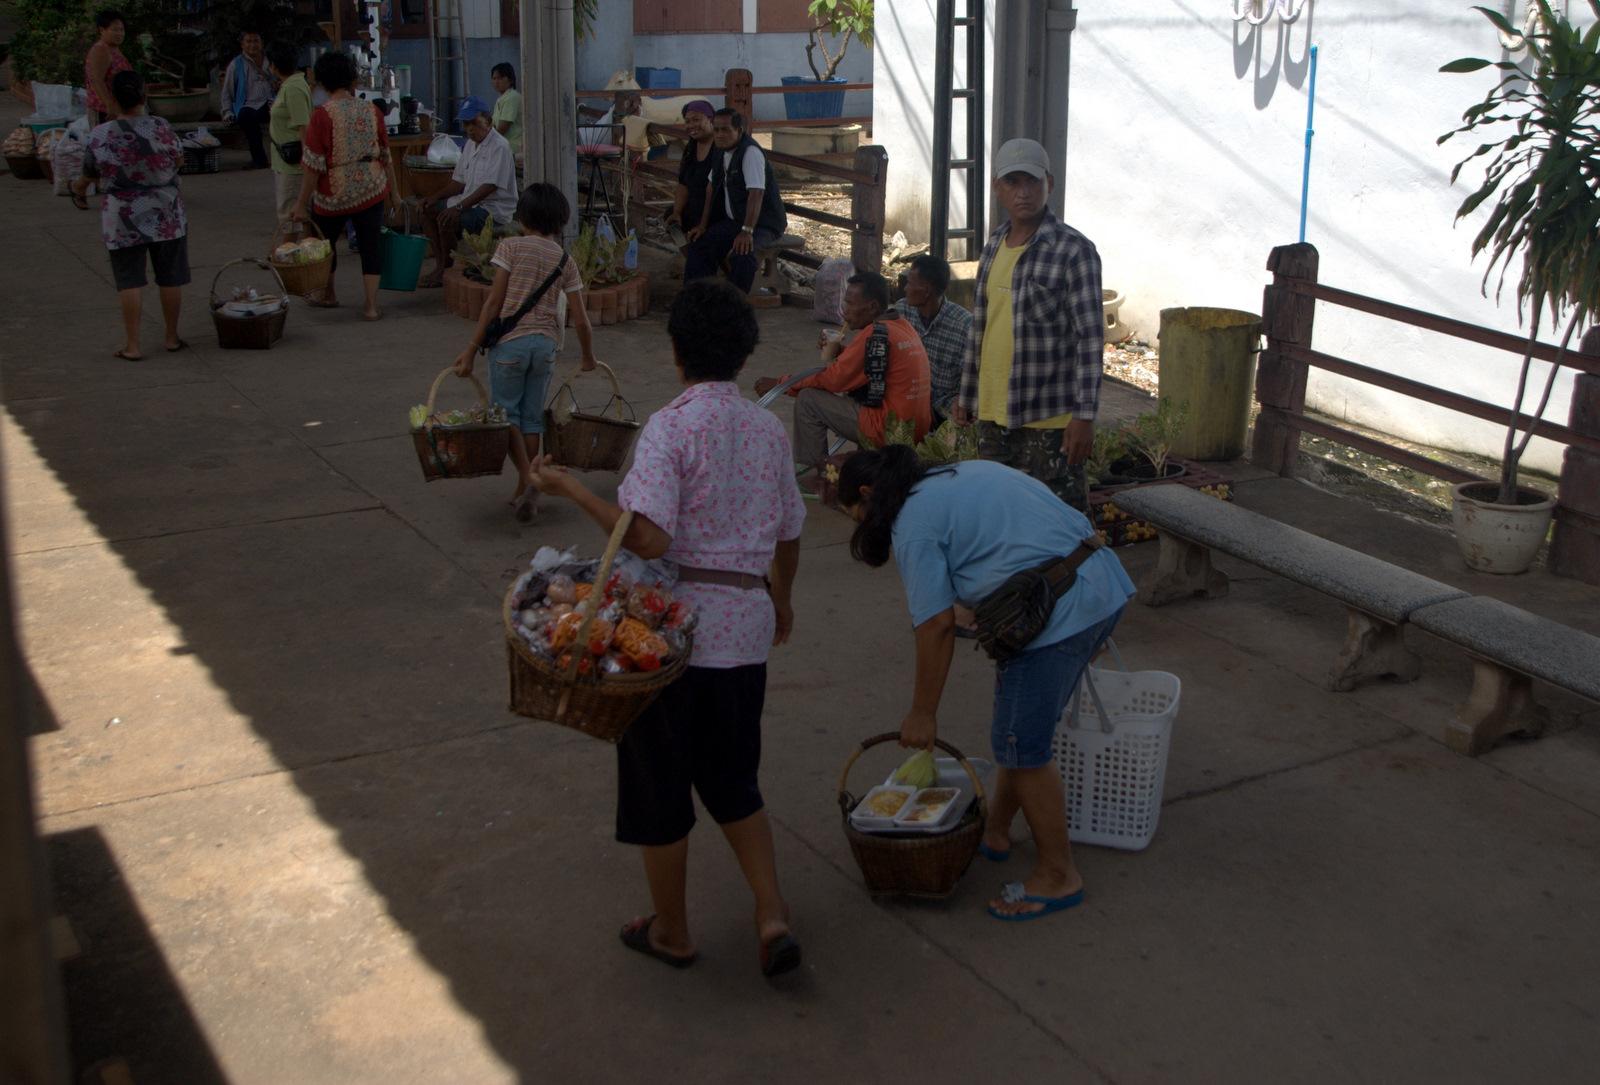 Miasta kultu, miasta małp, ale najbardziej Lampang 164